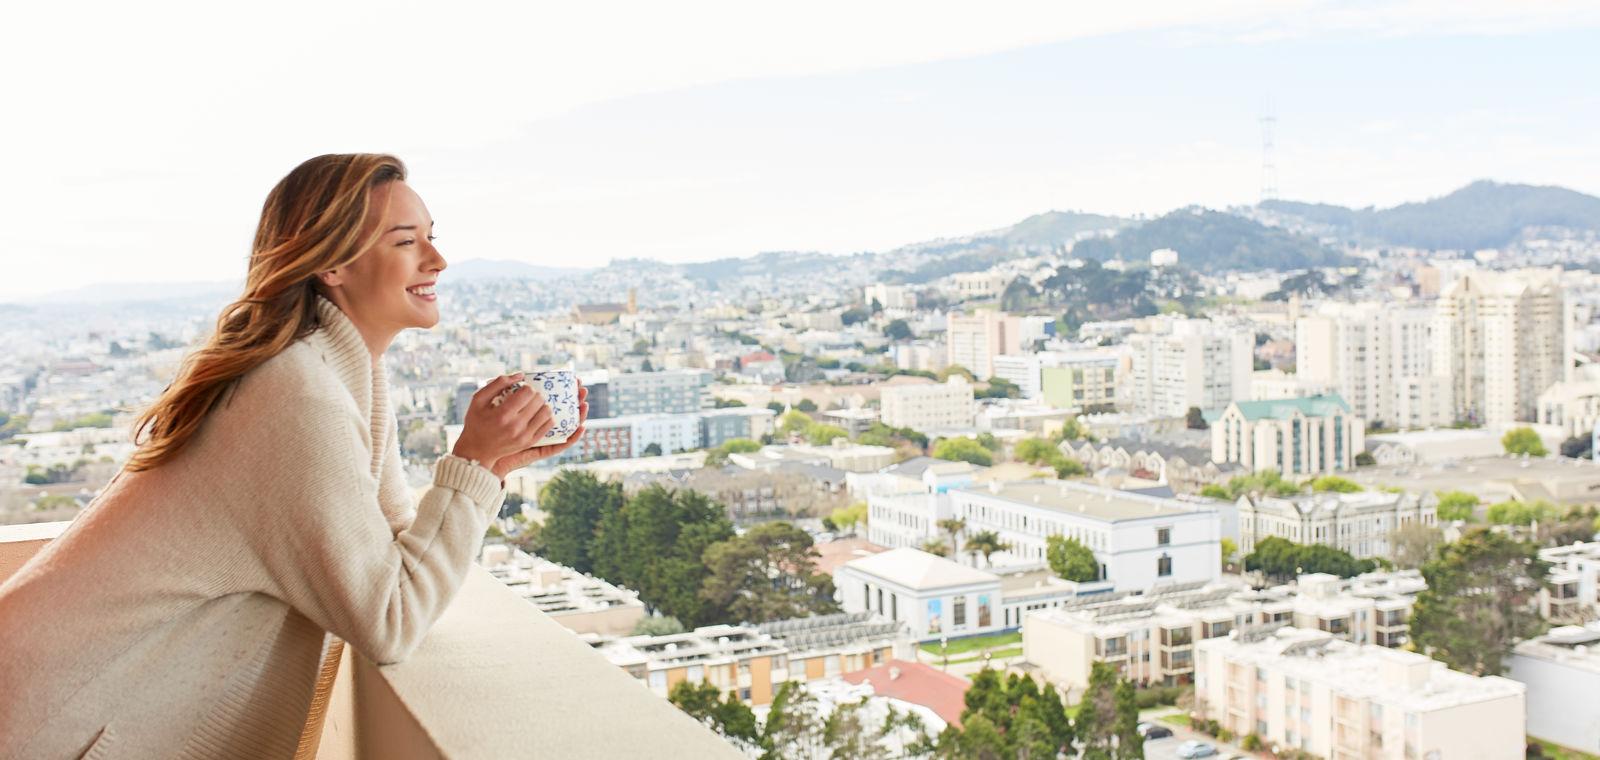 Woman Drinking Coffee on Balcony